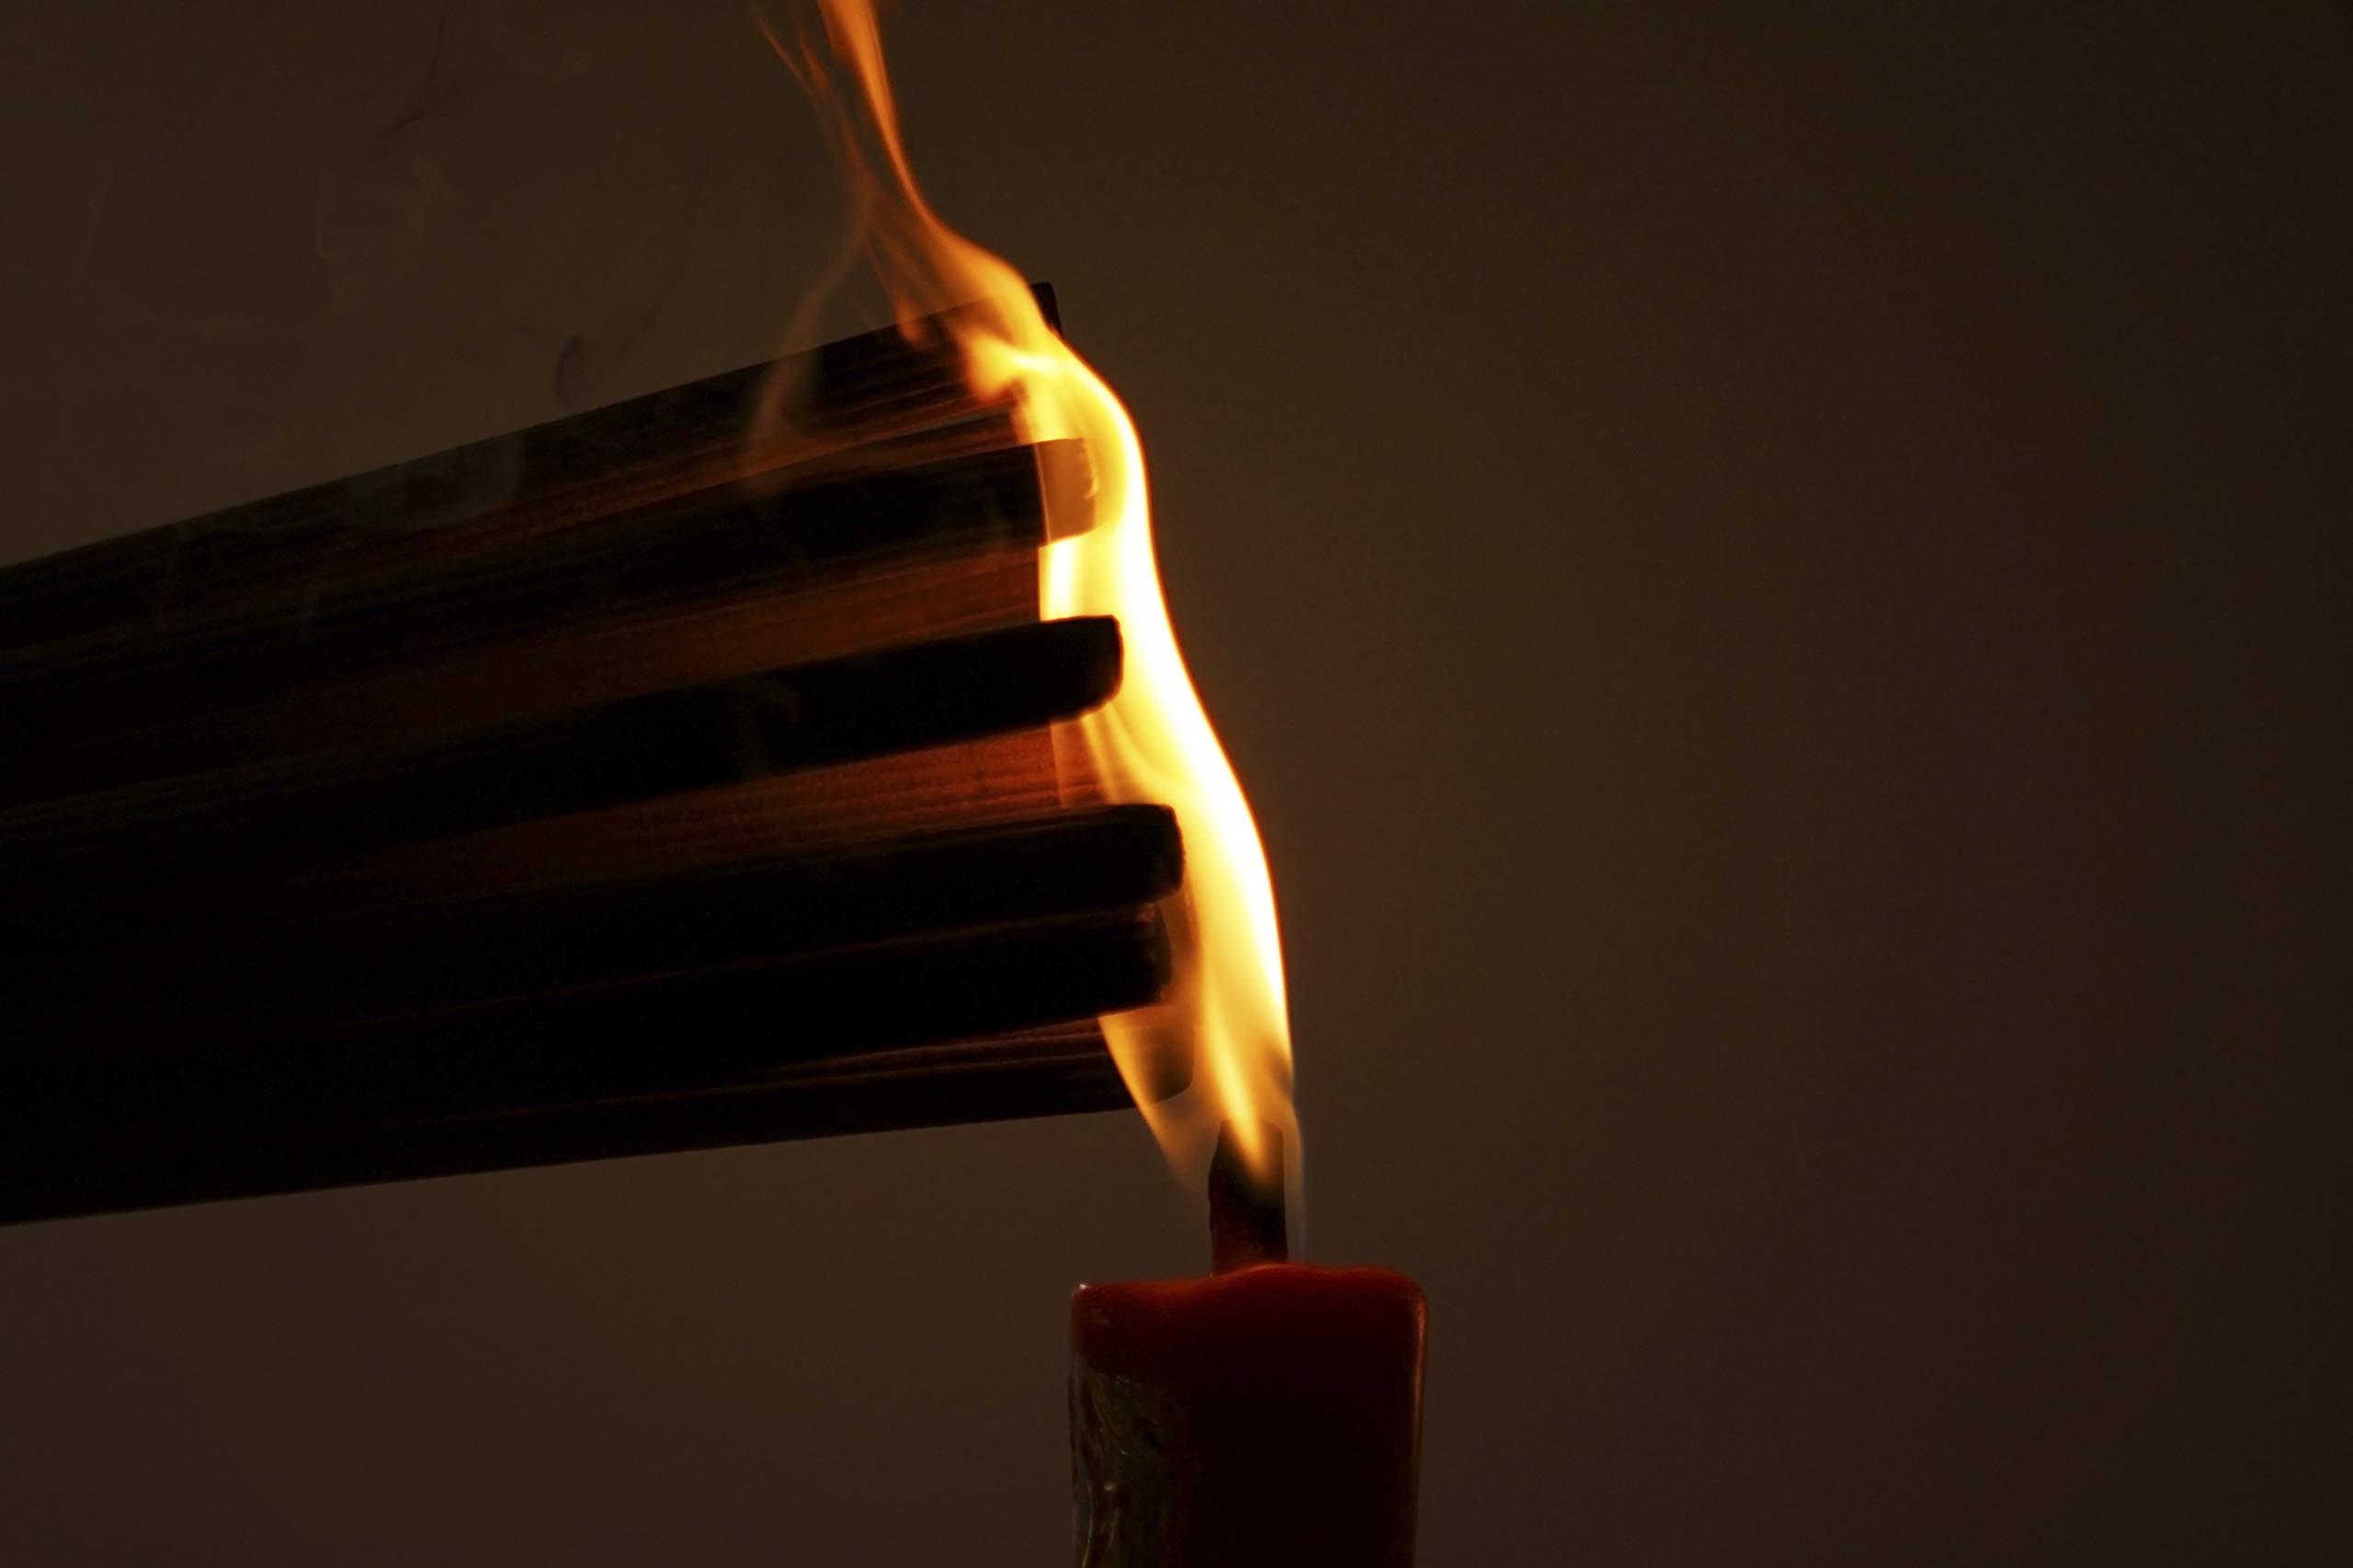 Genuine Oud Incense Sticks - New by Sensari (Image #8)